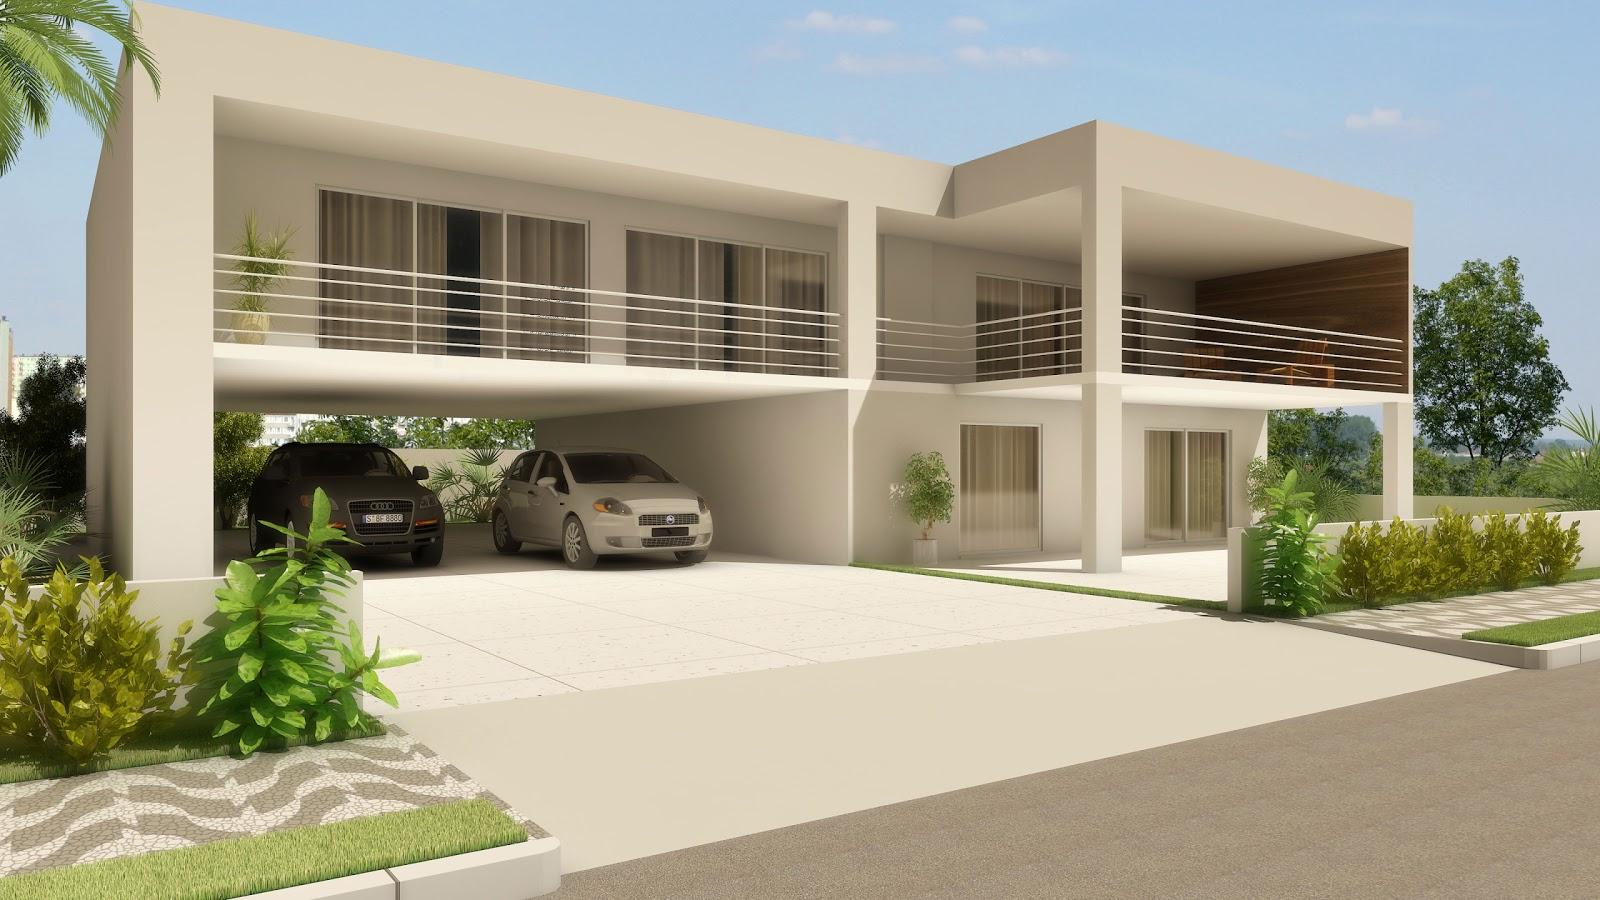 Thiago Sartori - Projetos 3D e AutoCAD